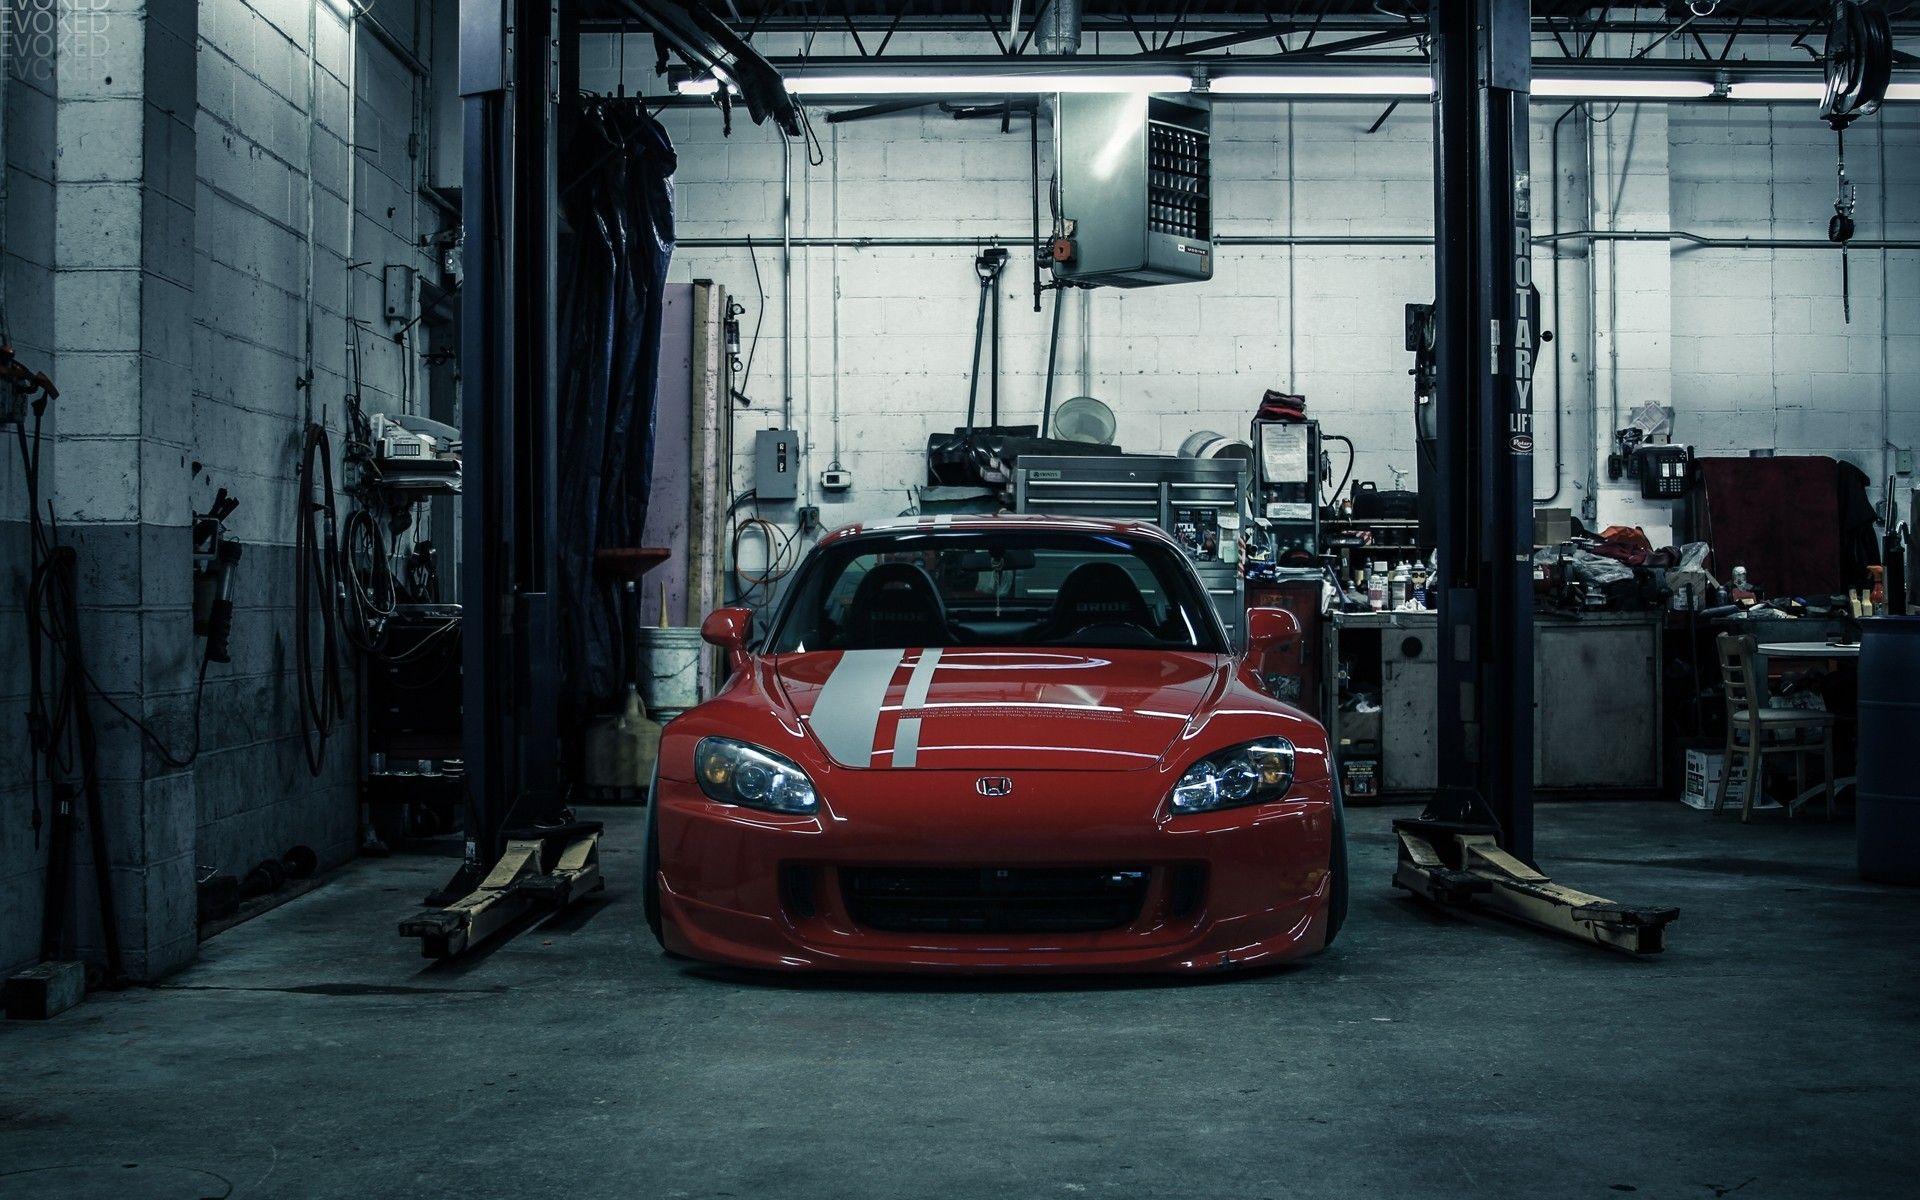 honda cars vehicles tuning garages red cars honda  sports cars jdm japanese domestic market